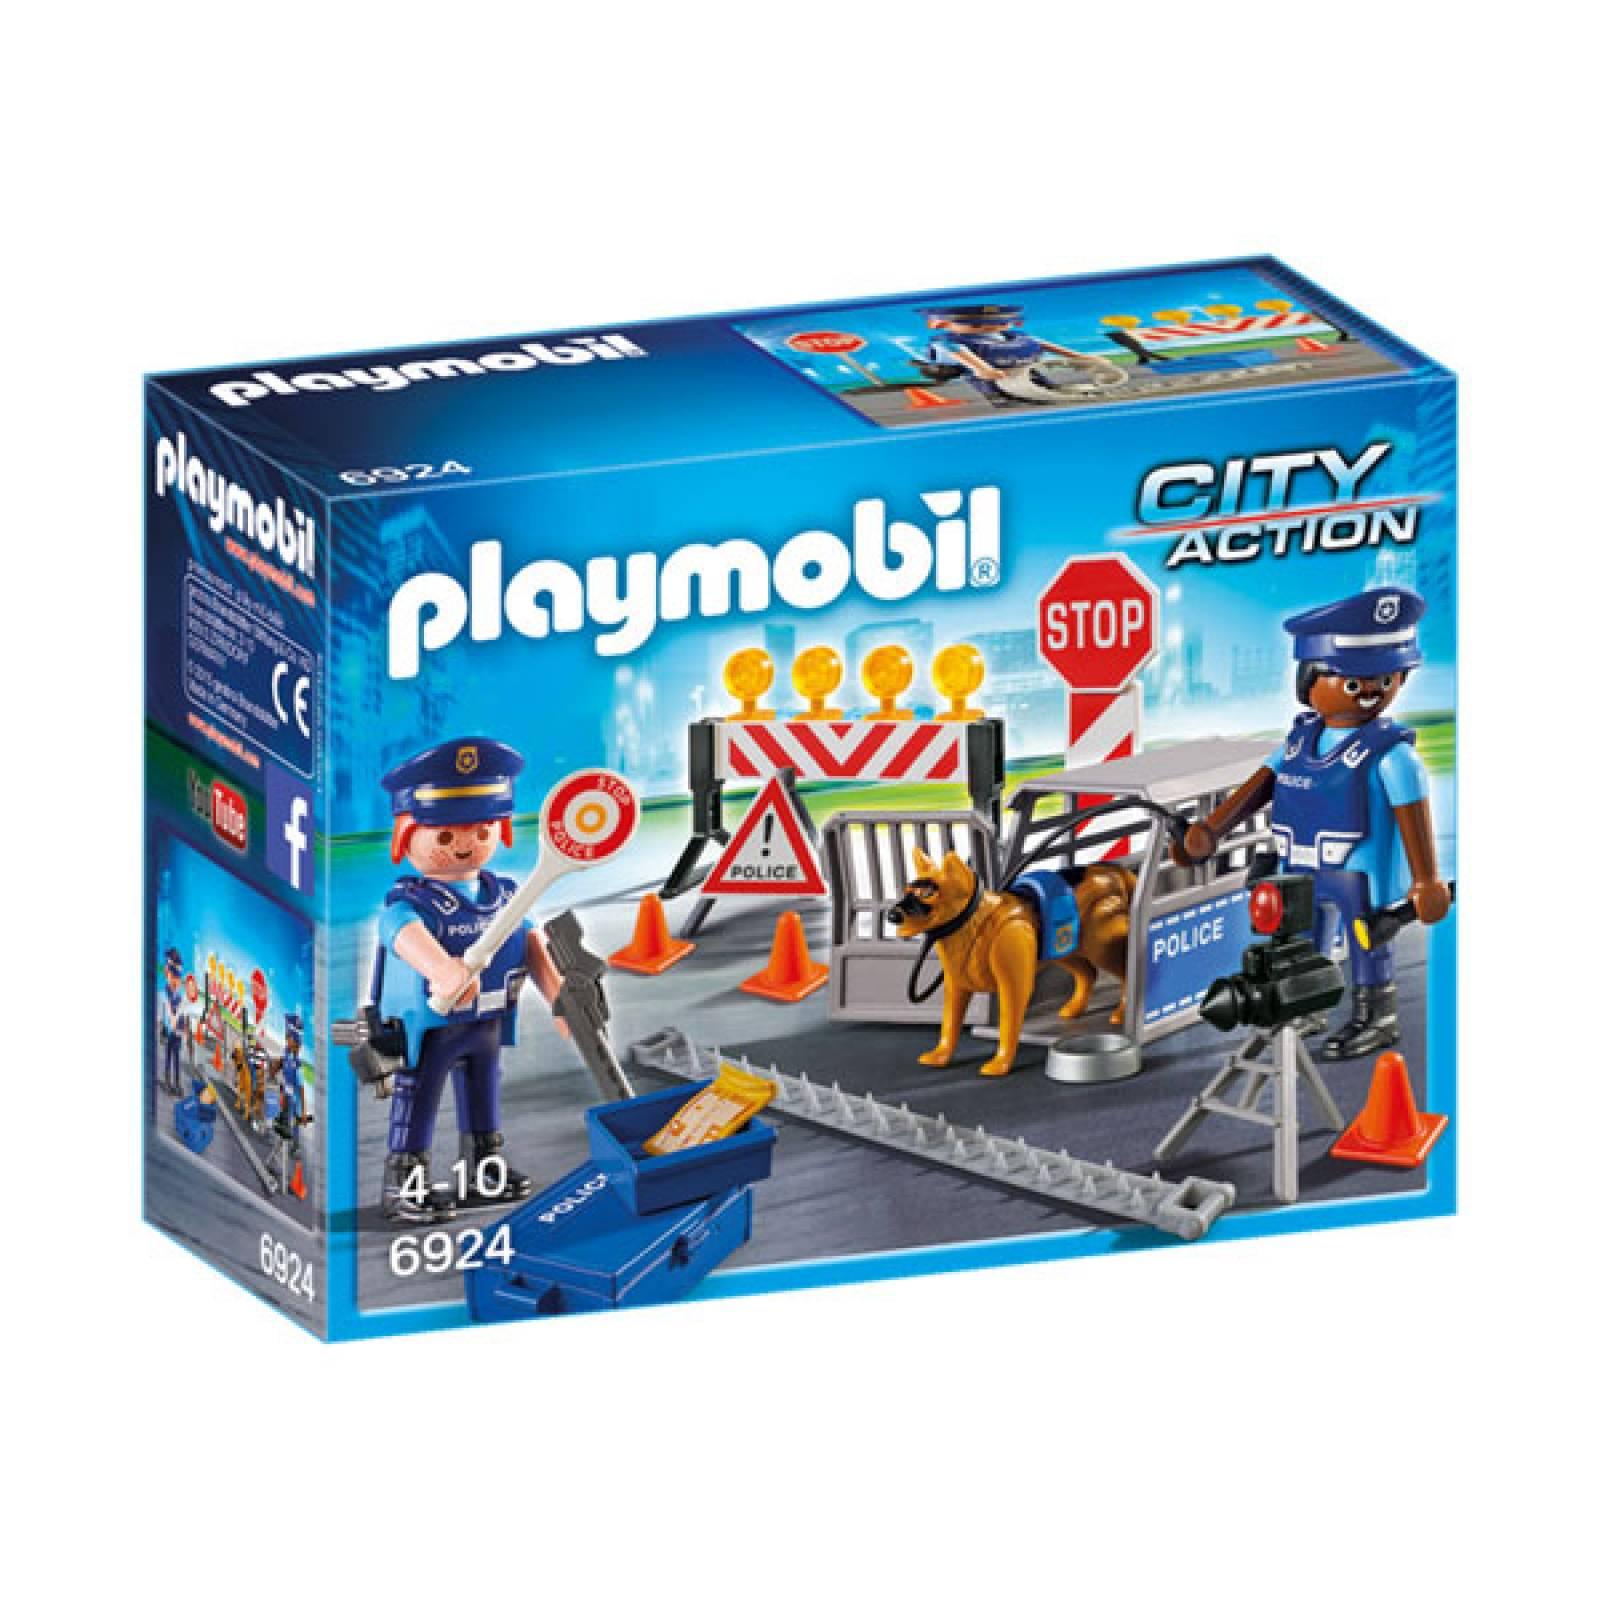 Police Roadblock City Action Playmobil 6924 thumbnails